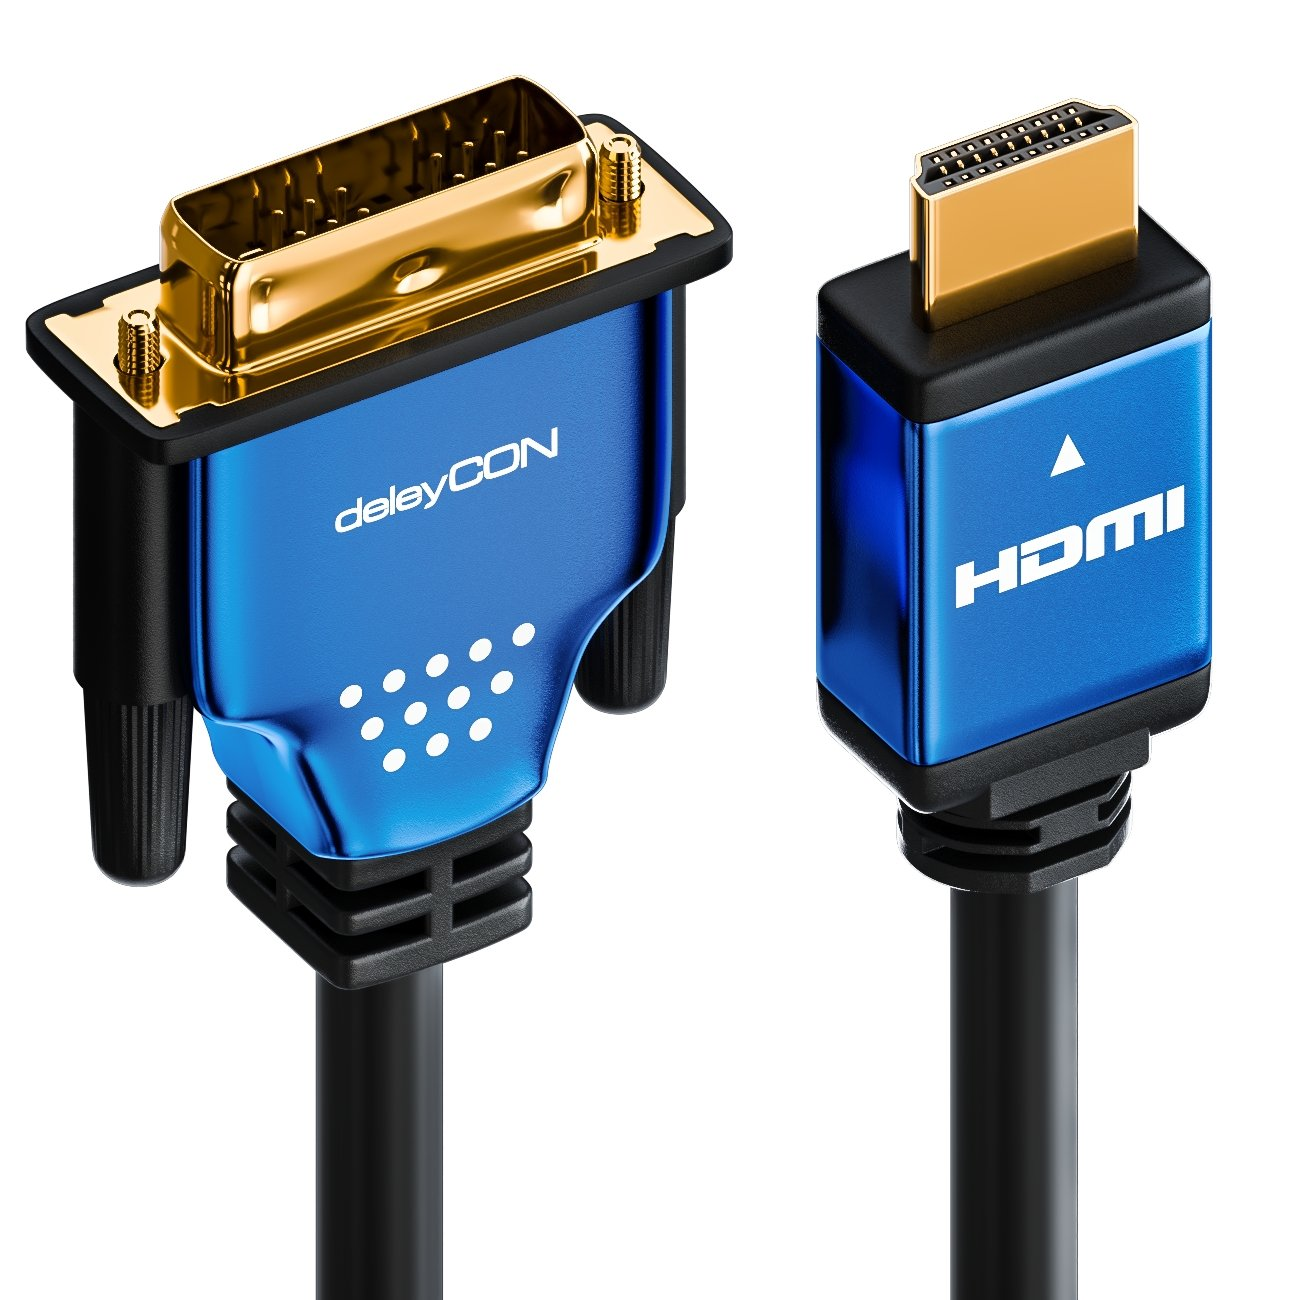 deleyCON HDMI a DVI negro Cable adaptador HDMI a DVI 1080p // Full HD // 3D Ready 2 m